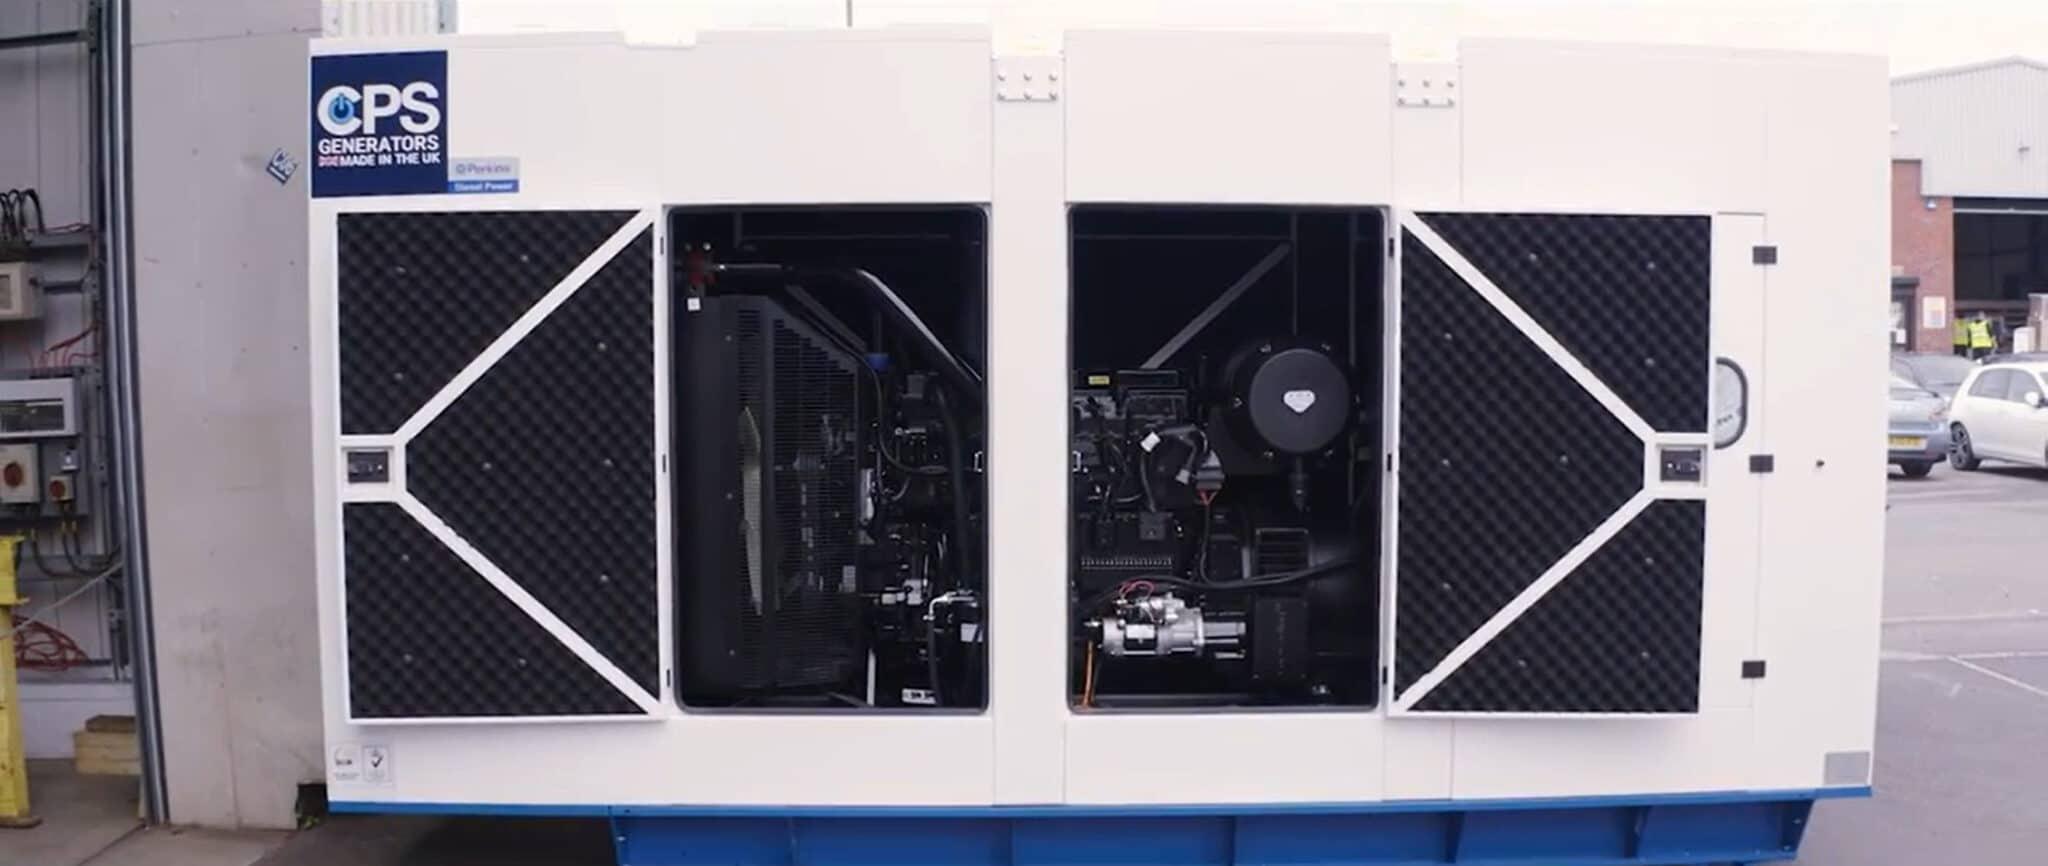 Bahamas Asphalt Factory AP510S-60HZ Open Generator  Constant Power Solutions